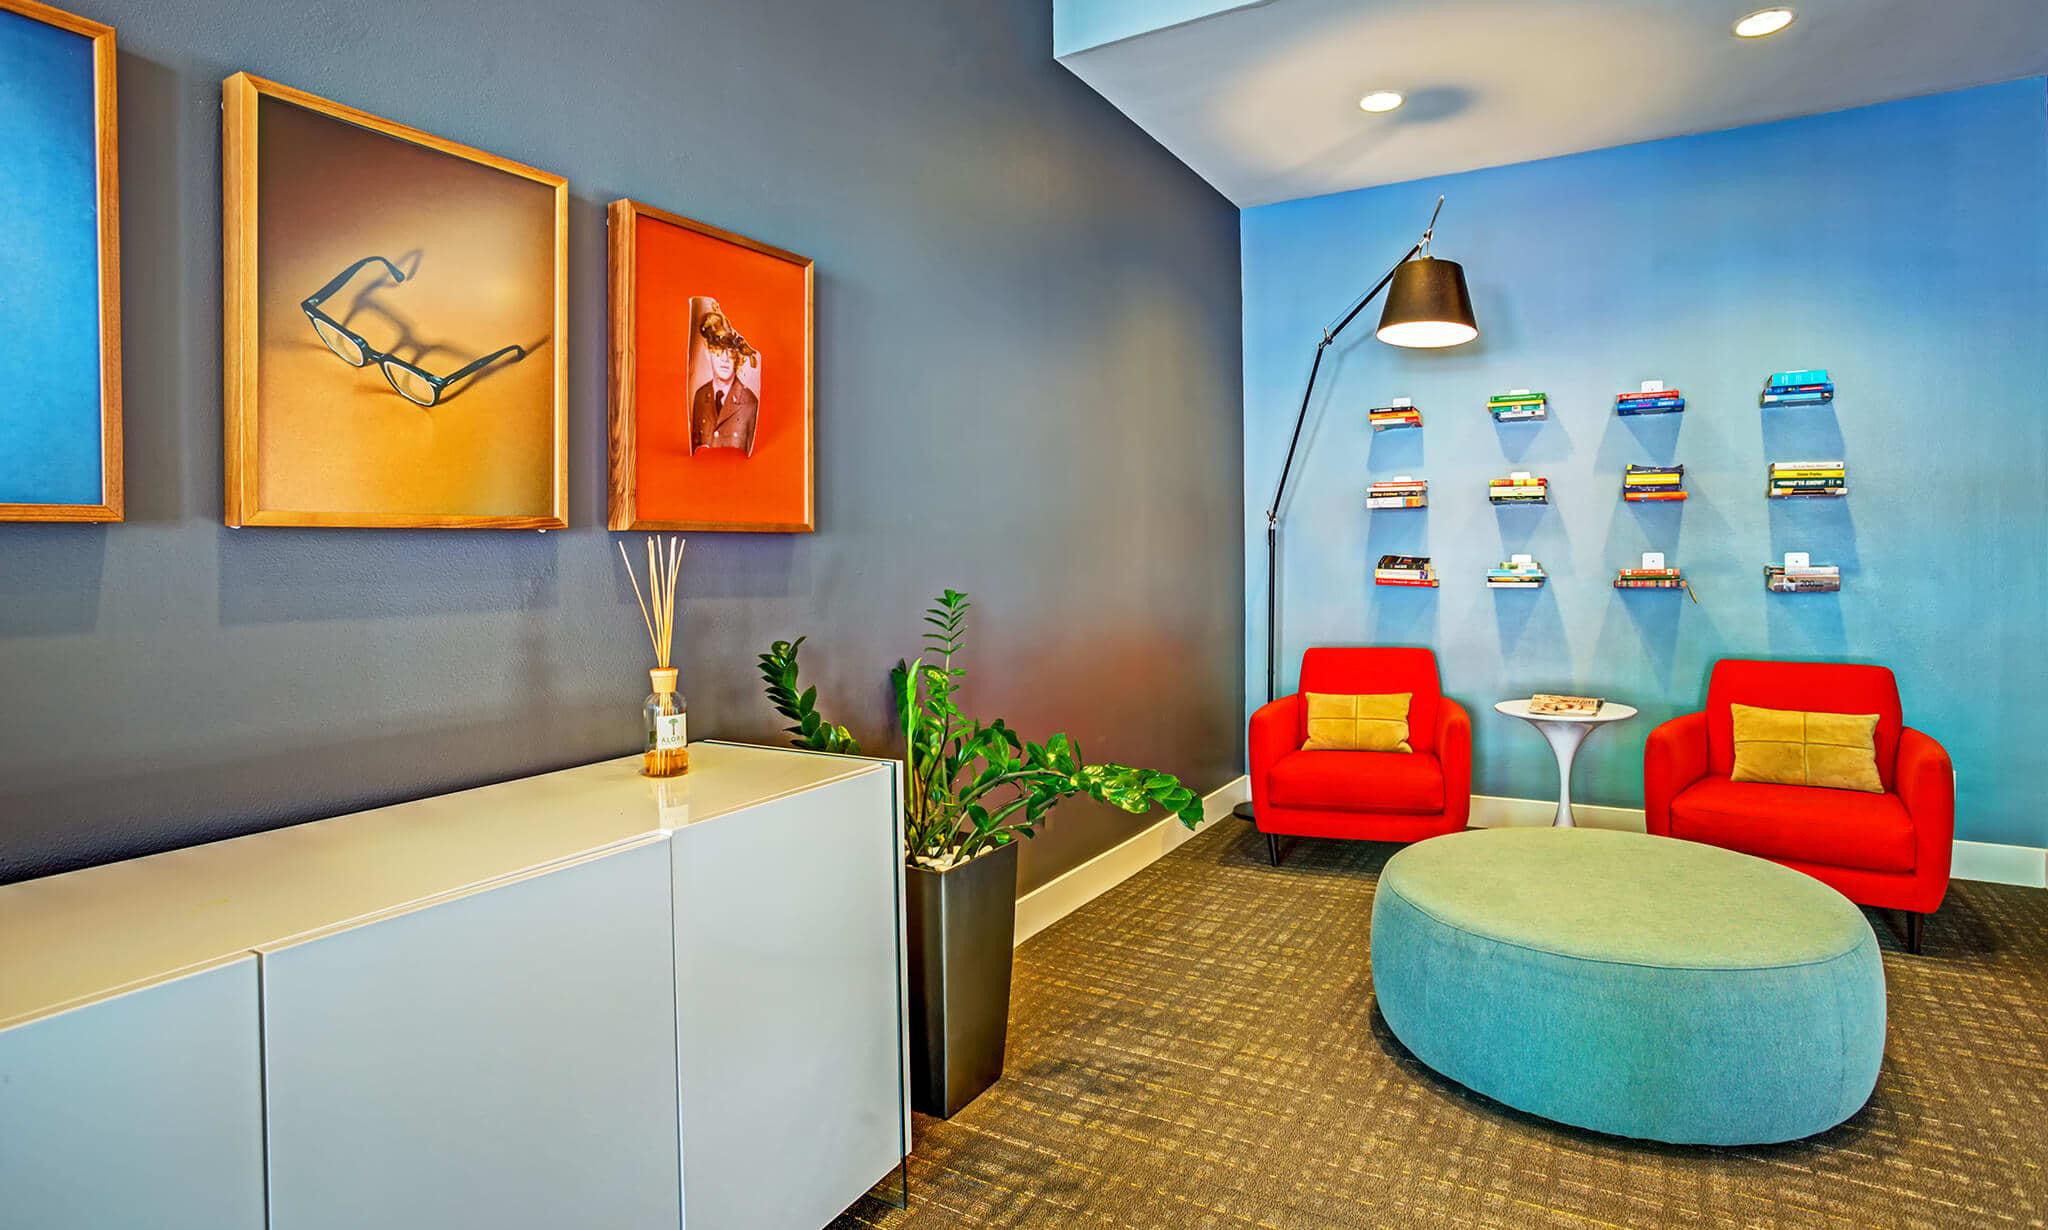 Alderwood Apartments apartments in Santa Clara CA to rent photo 3